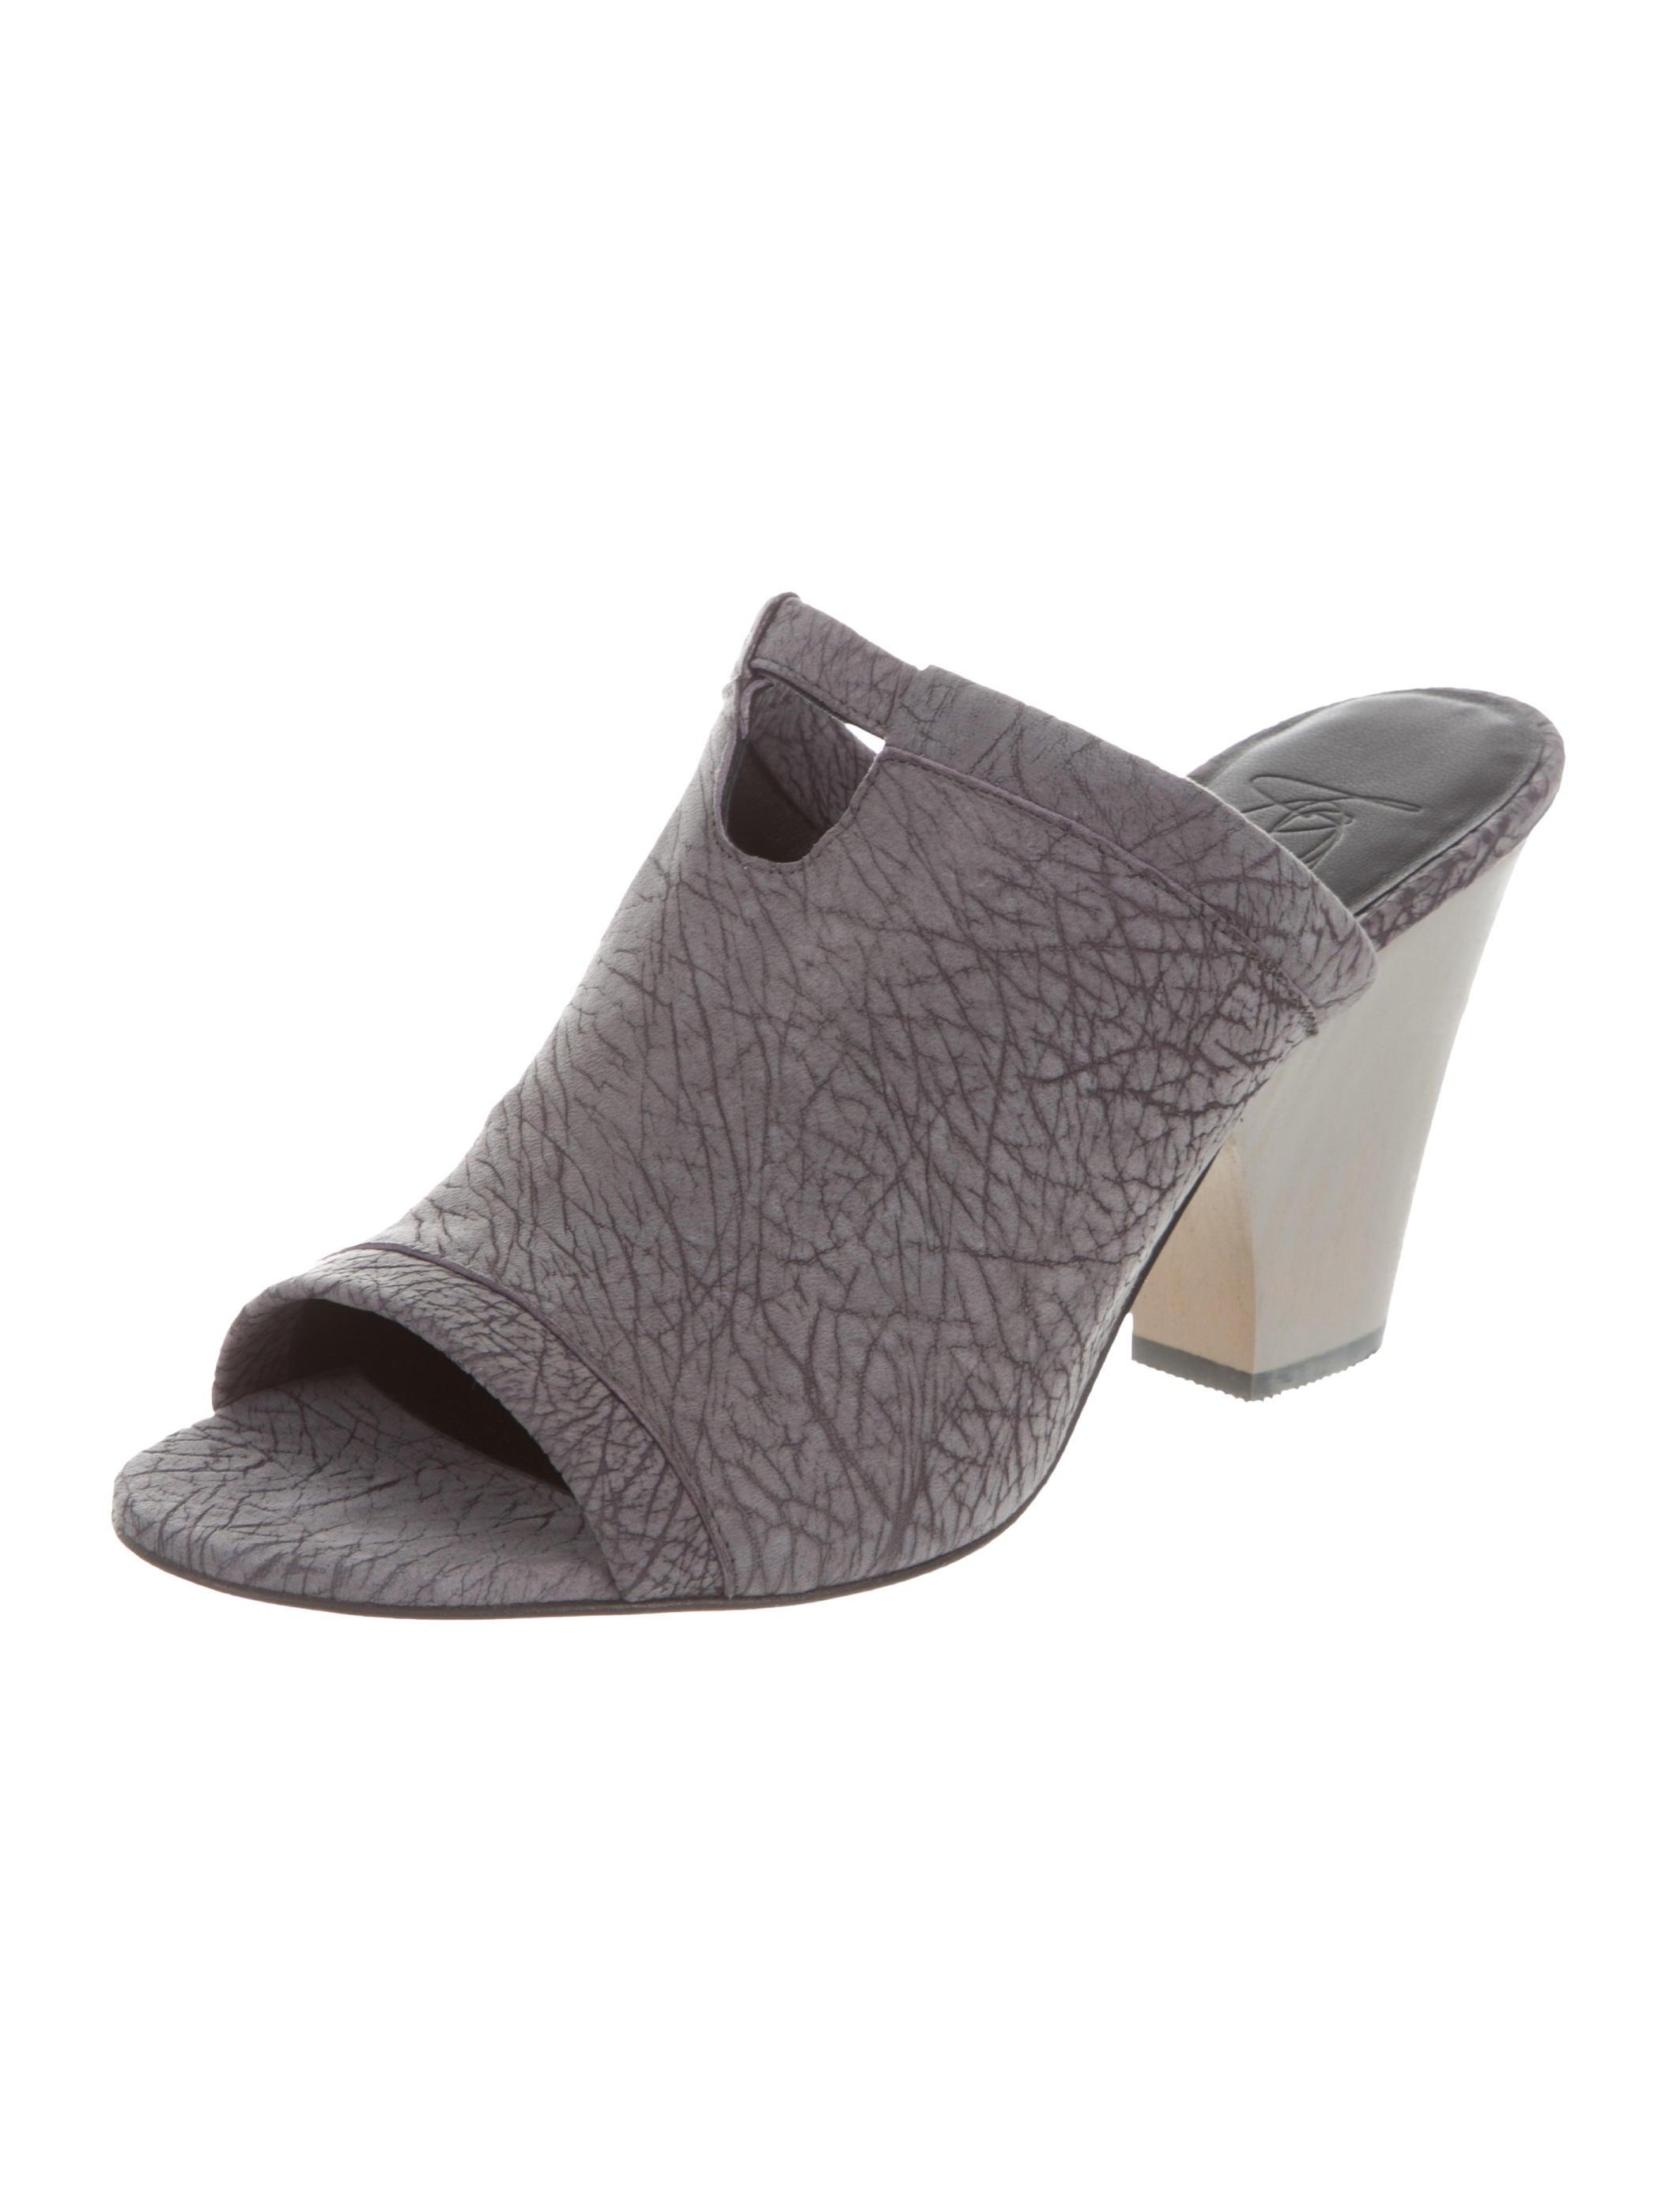 Zero + Maria Cornejo Suede Slide Sandals w/ Tags extremely WZ0mRwLGUA